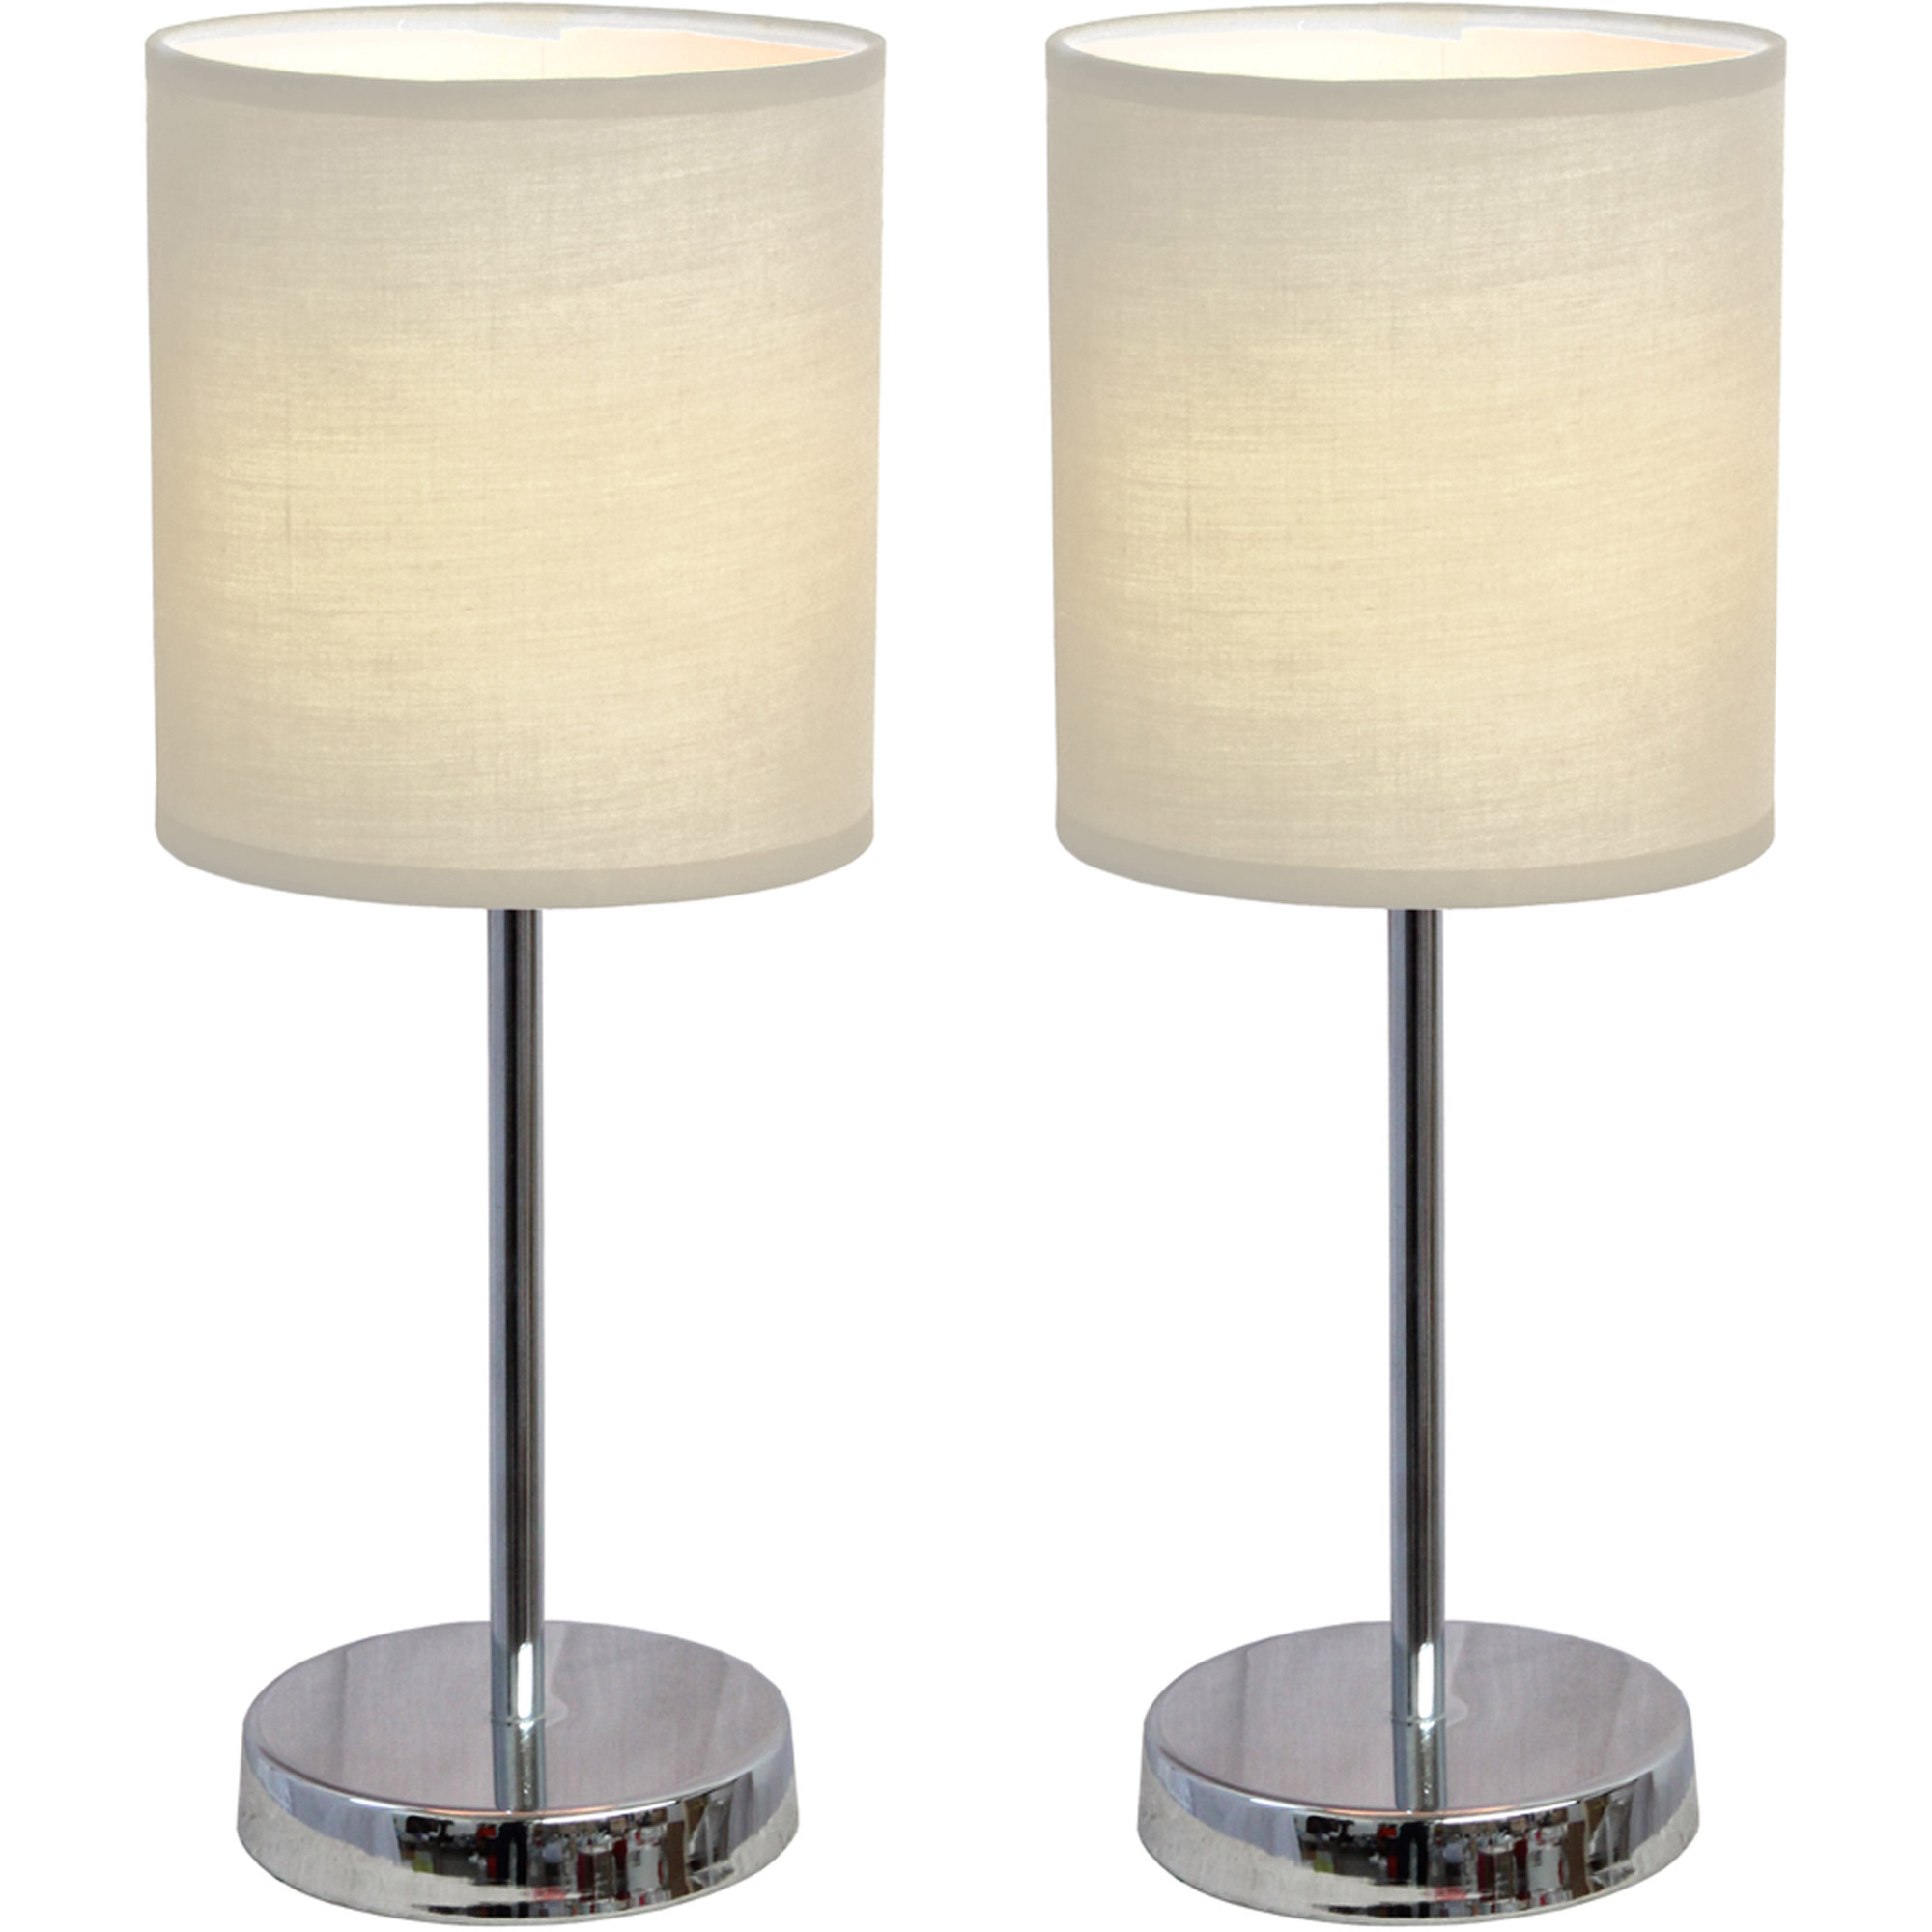 10 benefits of simple table lamp warisan lighting 10 benefits of simple table lamp geotapseo Images